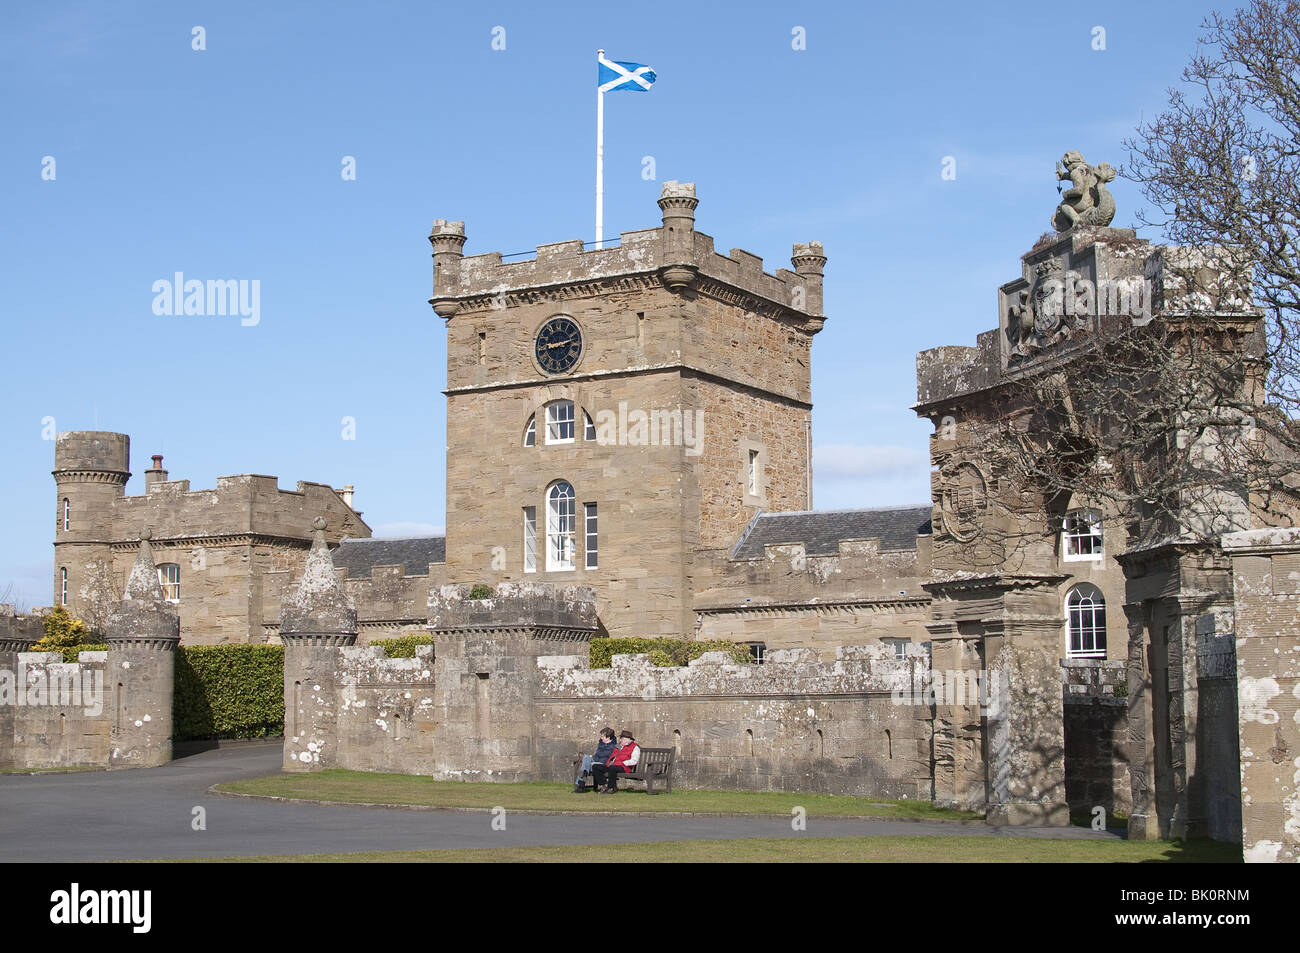 Culzean Castle near Maybole, Carrick on the Ayrshire coast of Scotland - Stock Image